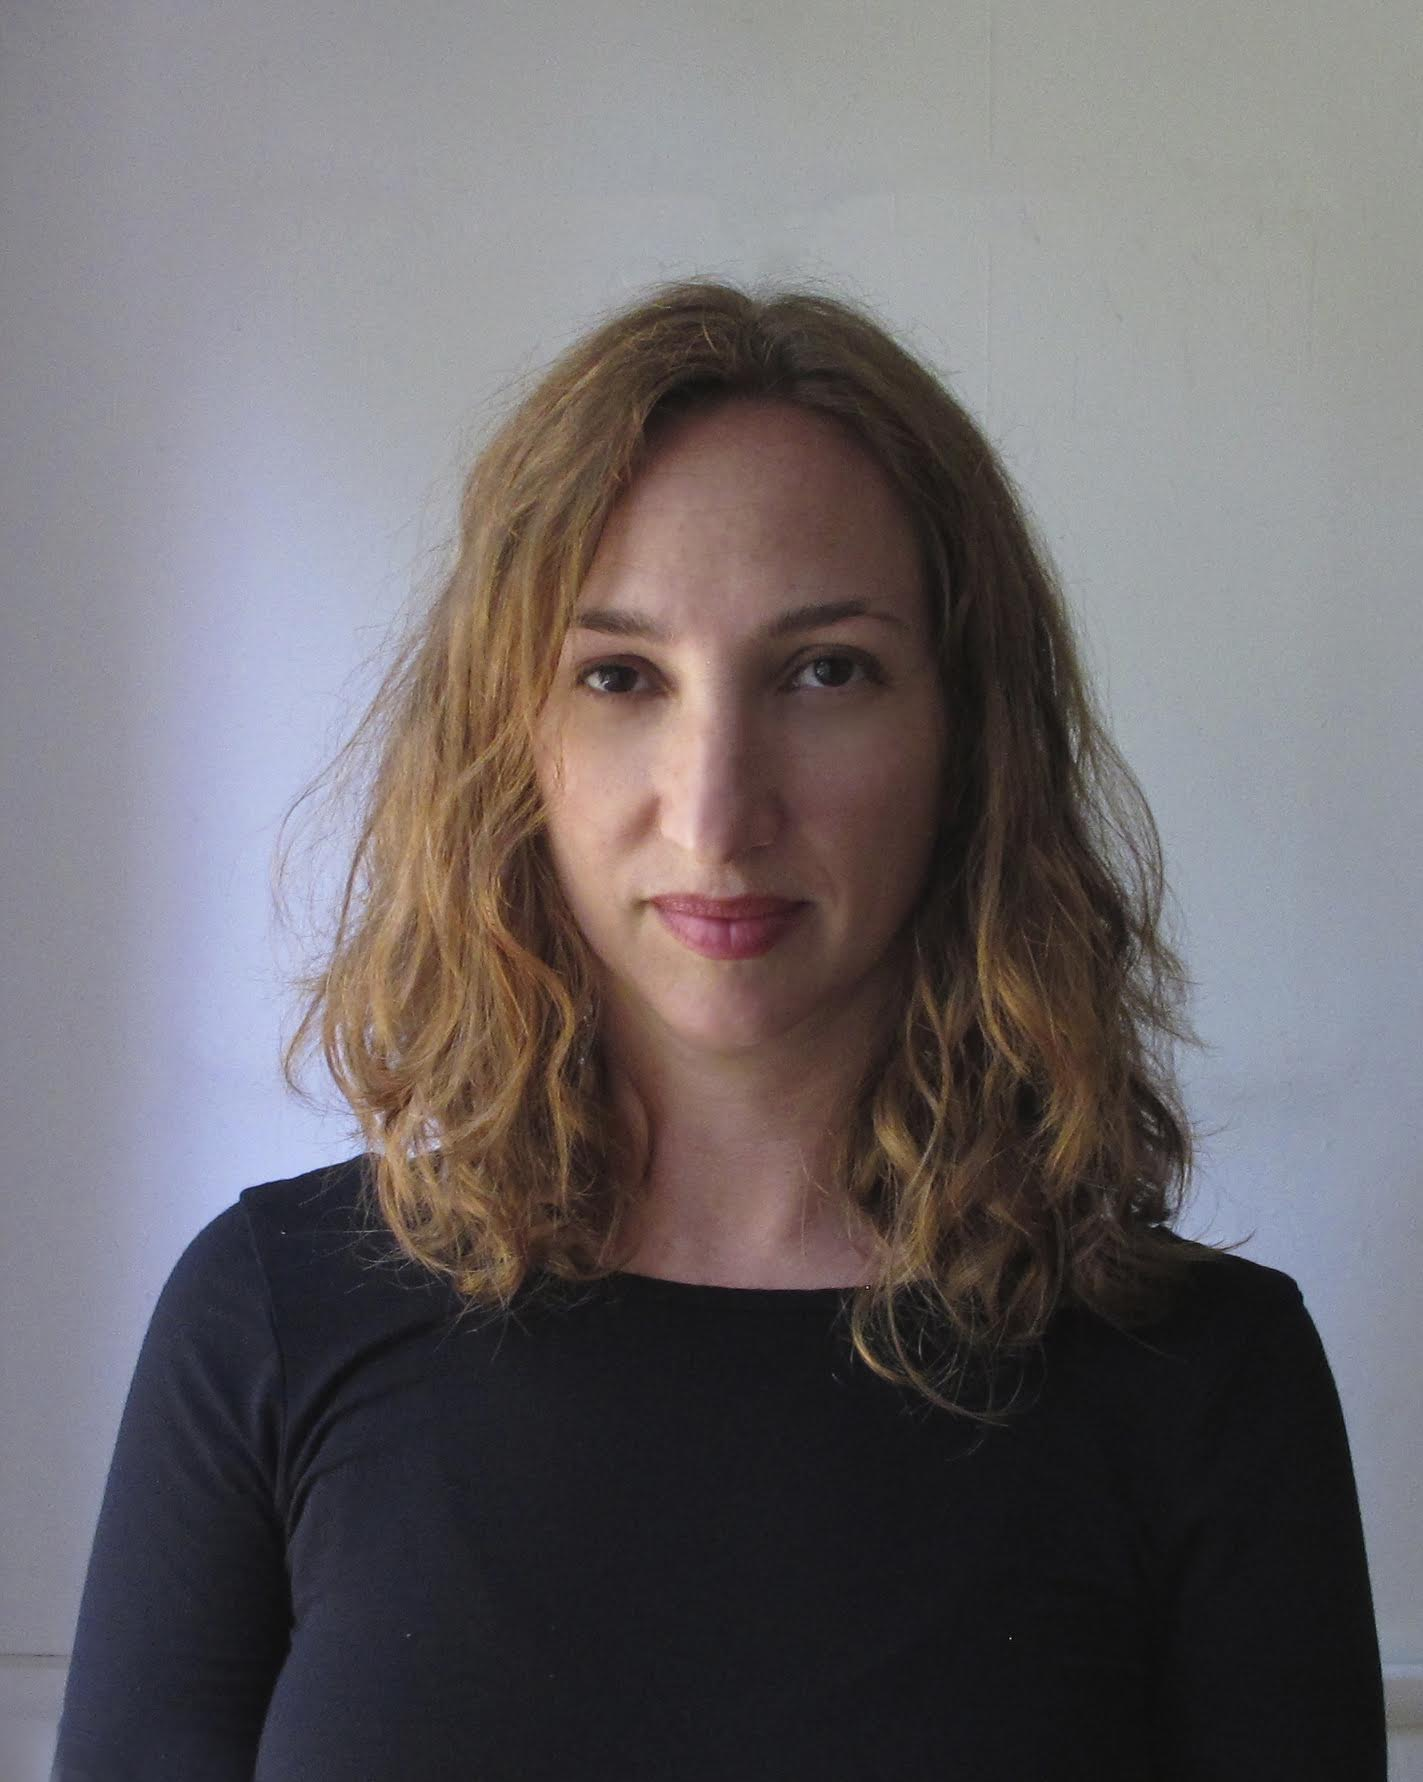 Johanna Debiase